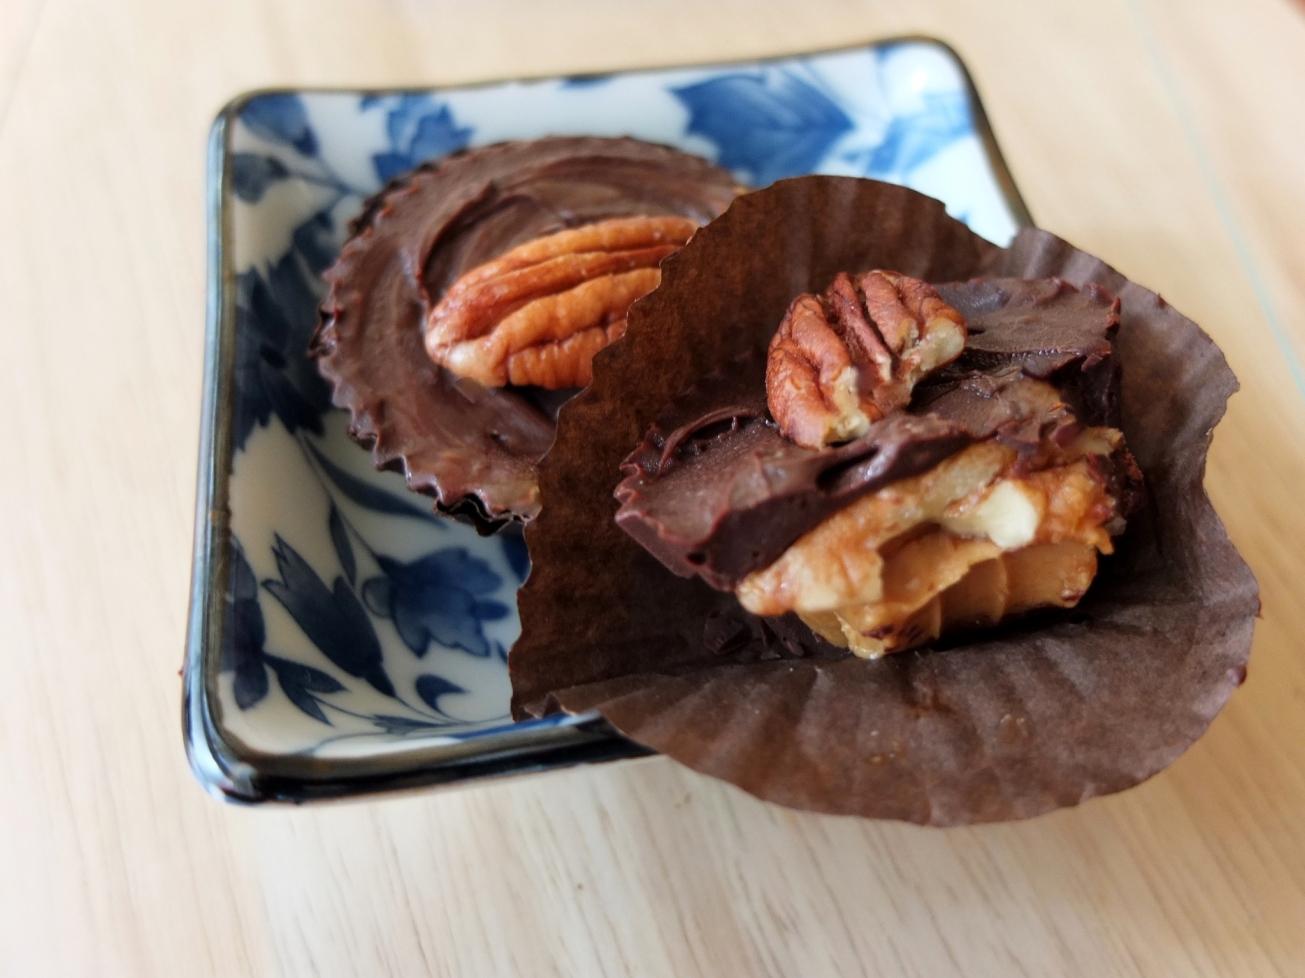 Salted date caramel peanut butter cups